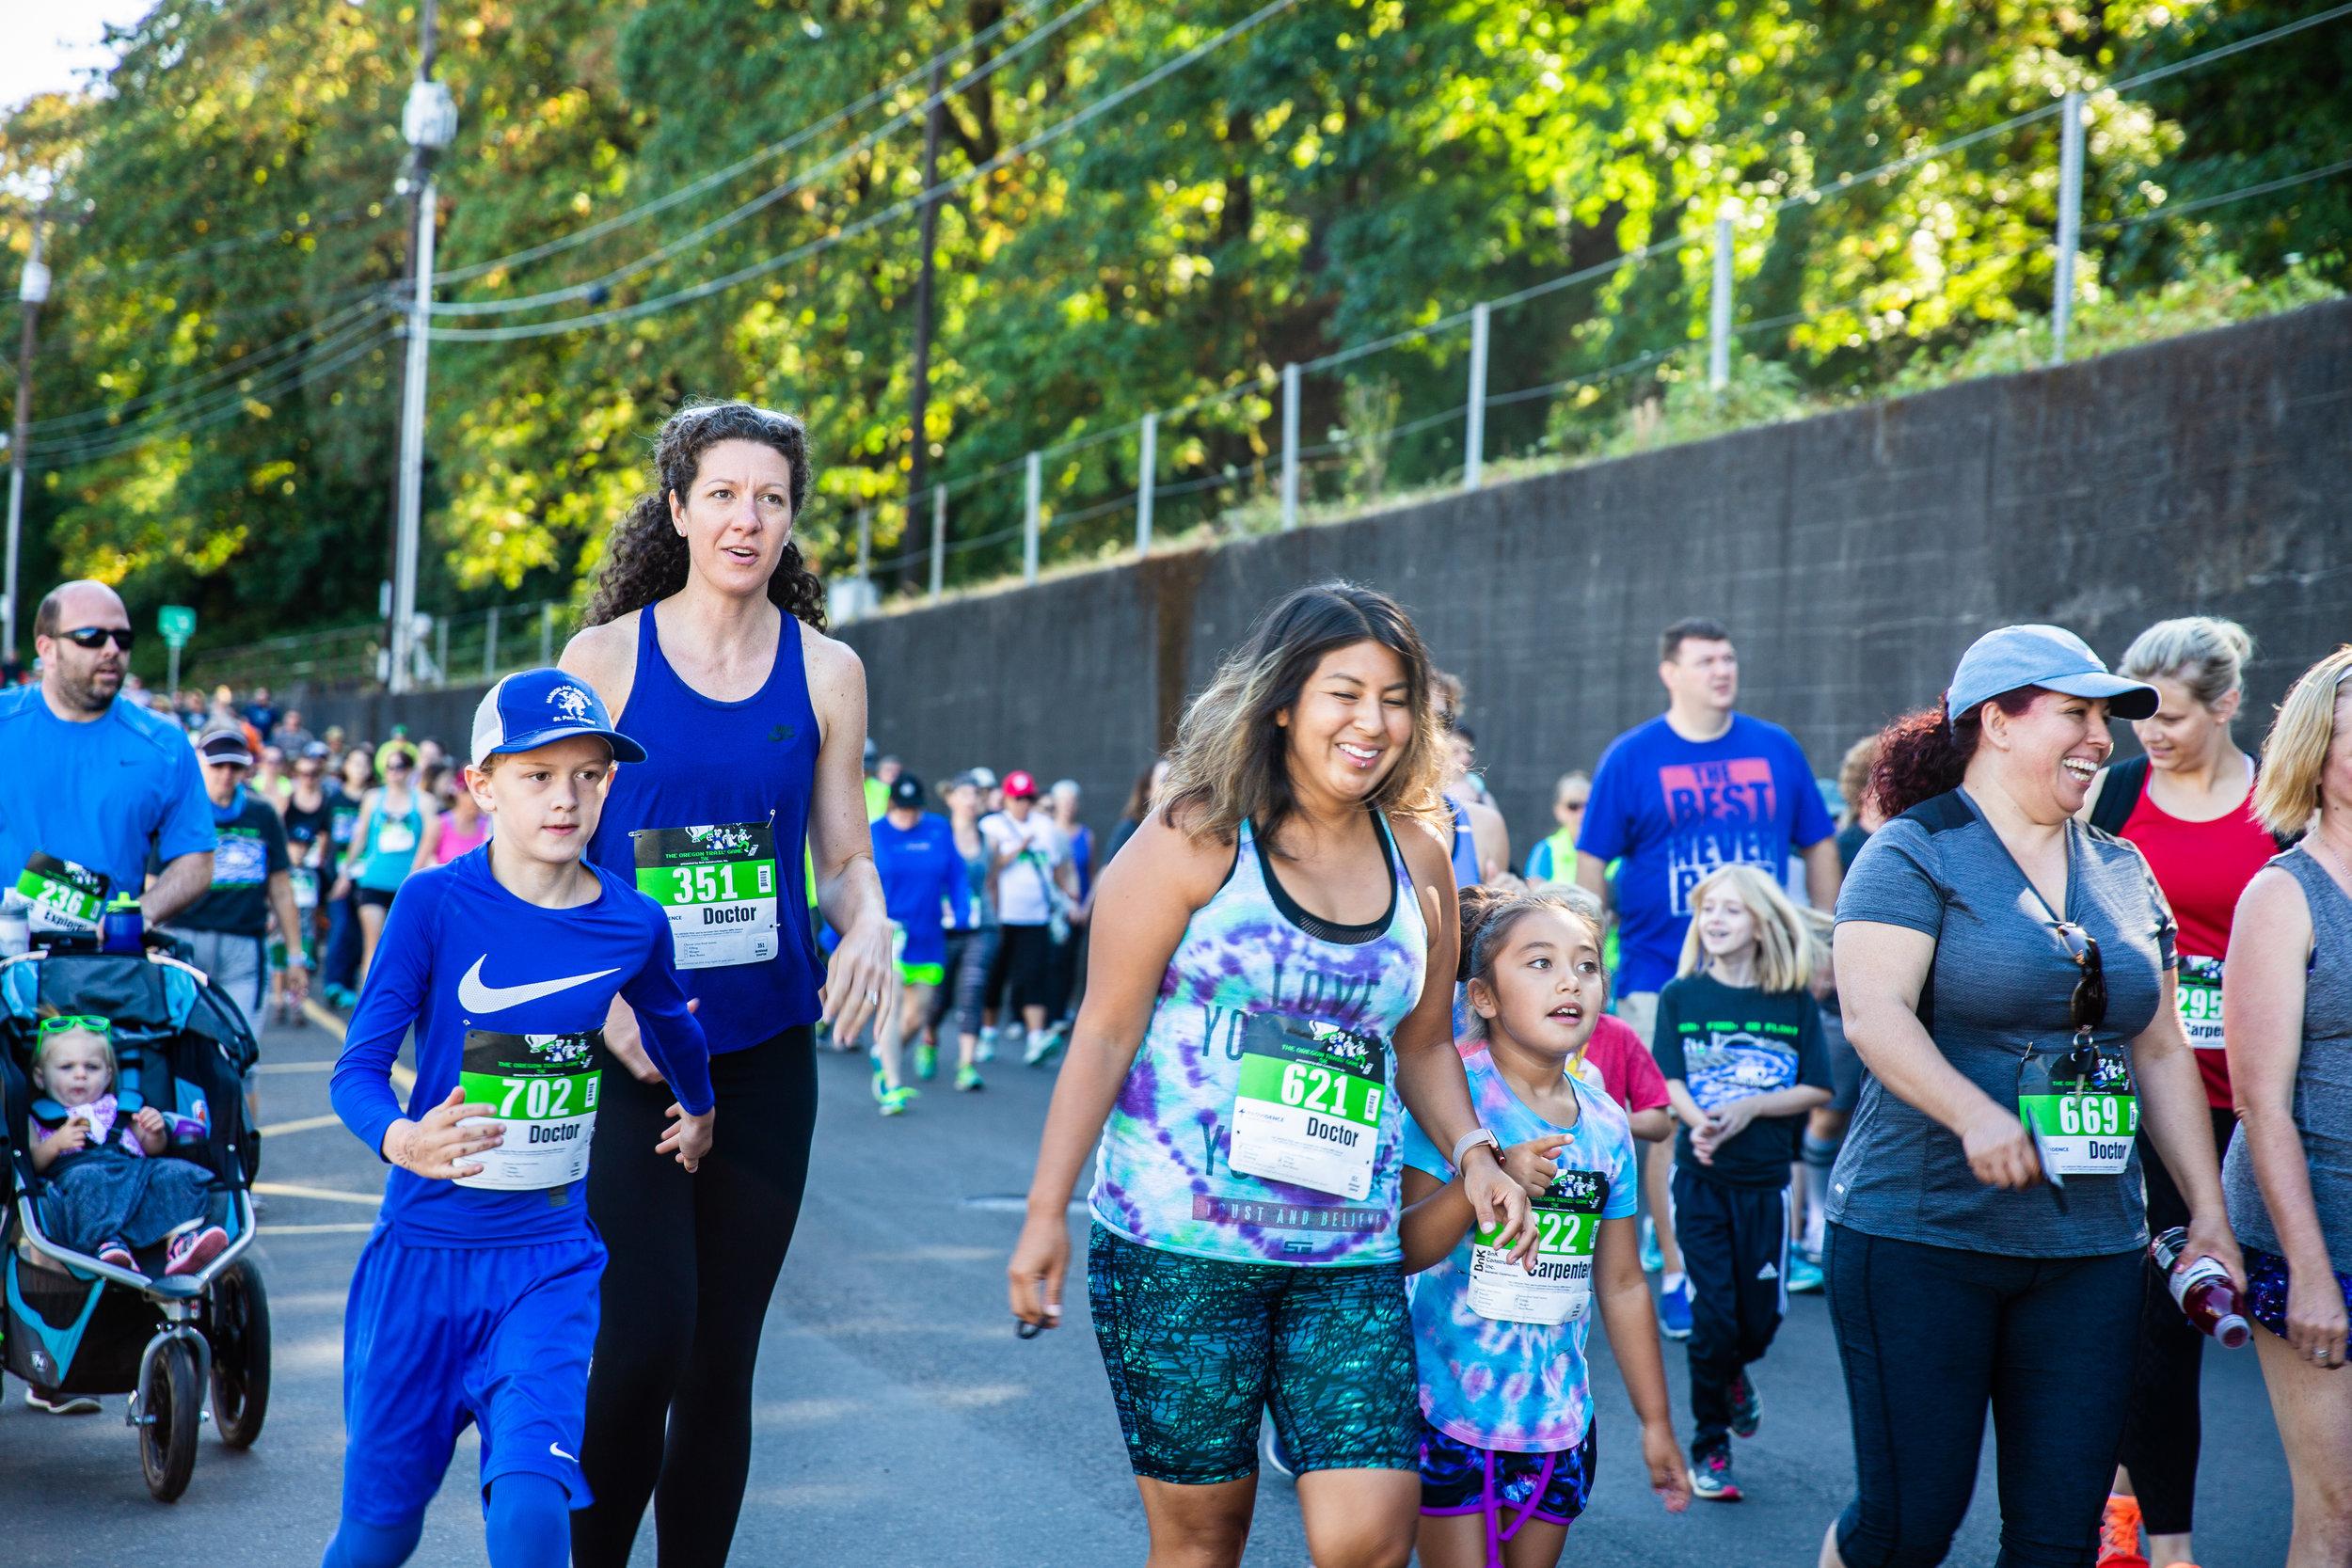 080518-Downtown-Oregon-City-5K-Run-Final-Selects-HR-5.jpg